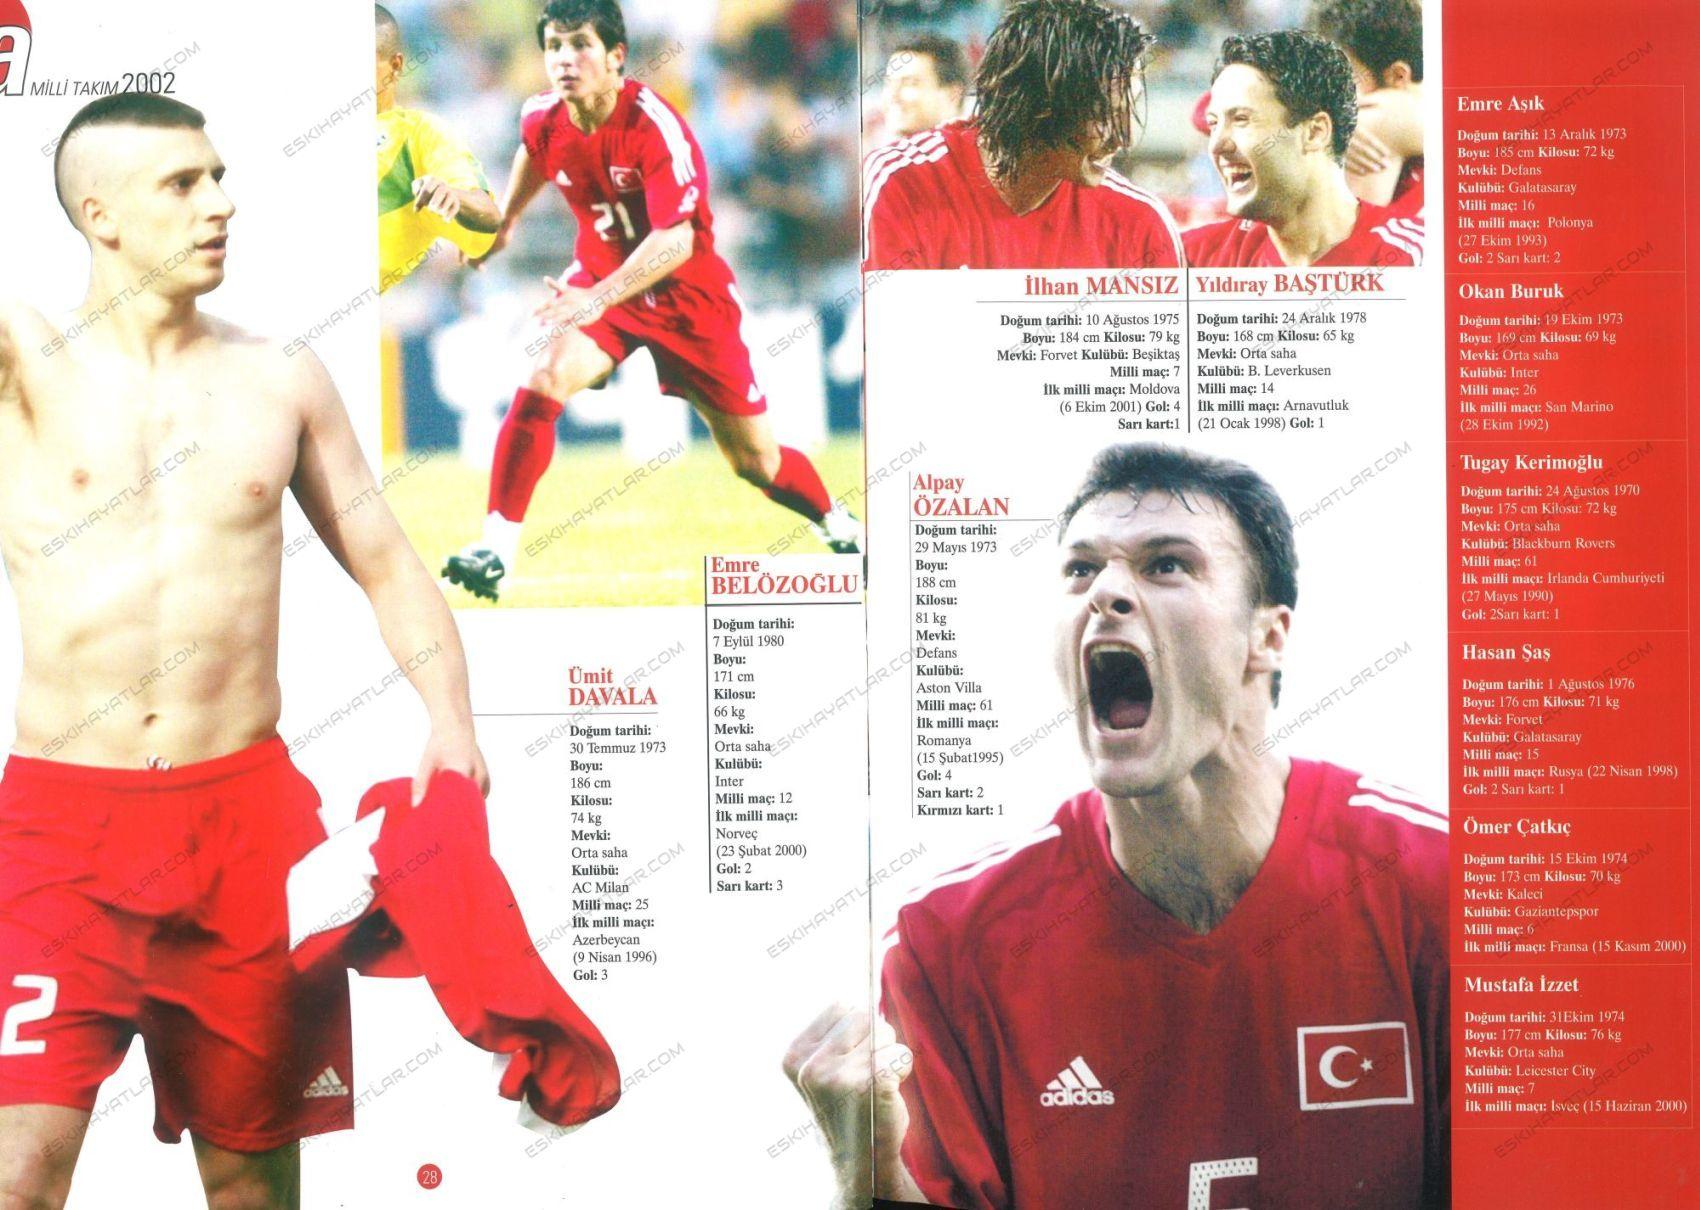 0406-turkiye-a-milli-takimi-2002-dunya-kupasi-kadrosu-aktuel-dergisi (10)